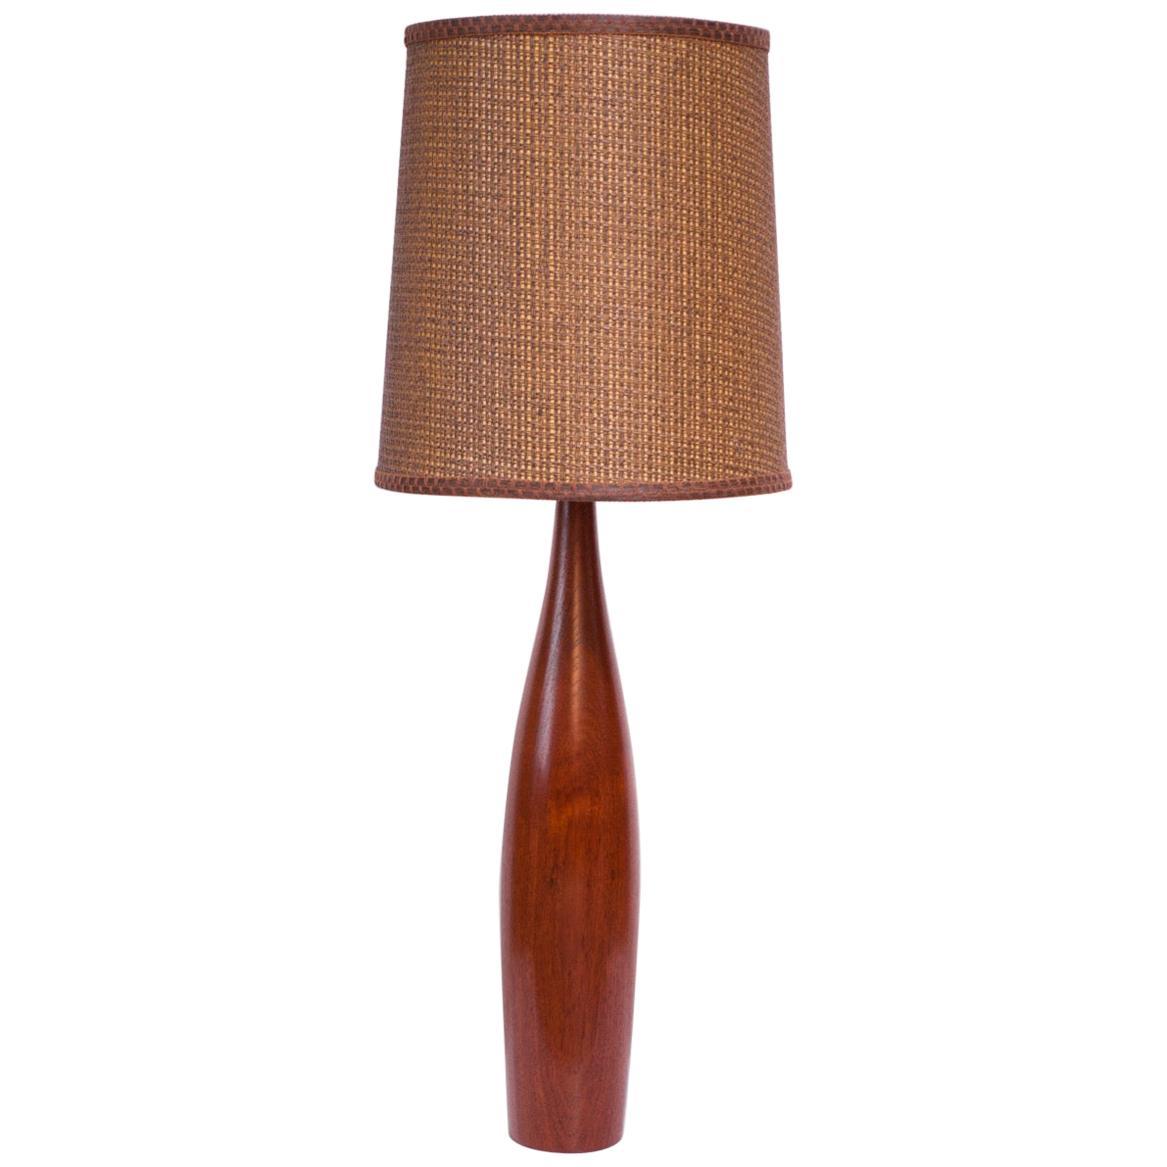 Tall Danish Modern Turned Teak Lamp by ESA